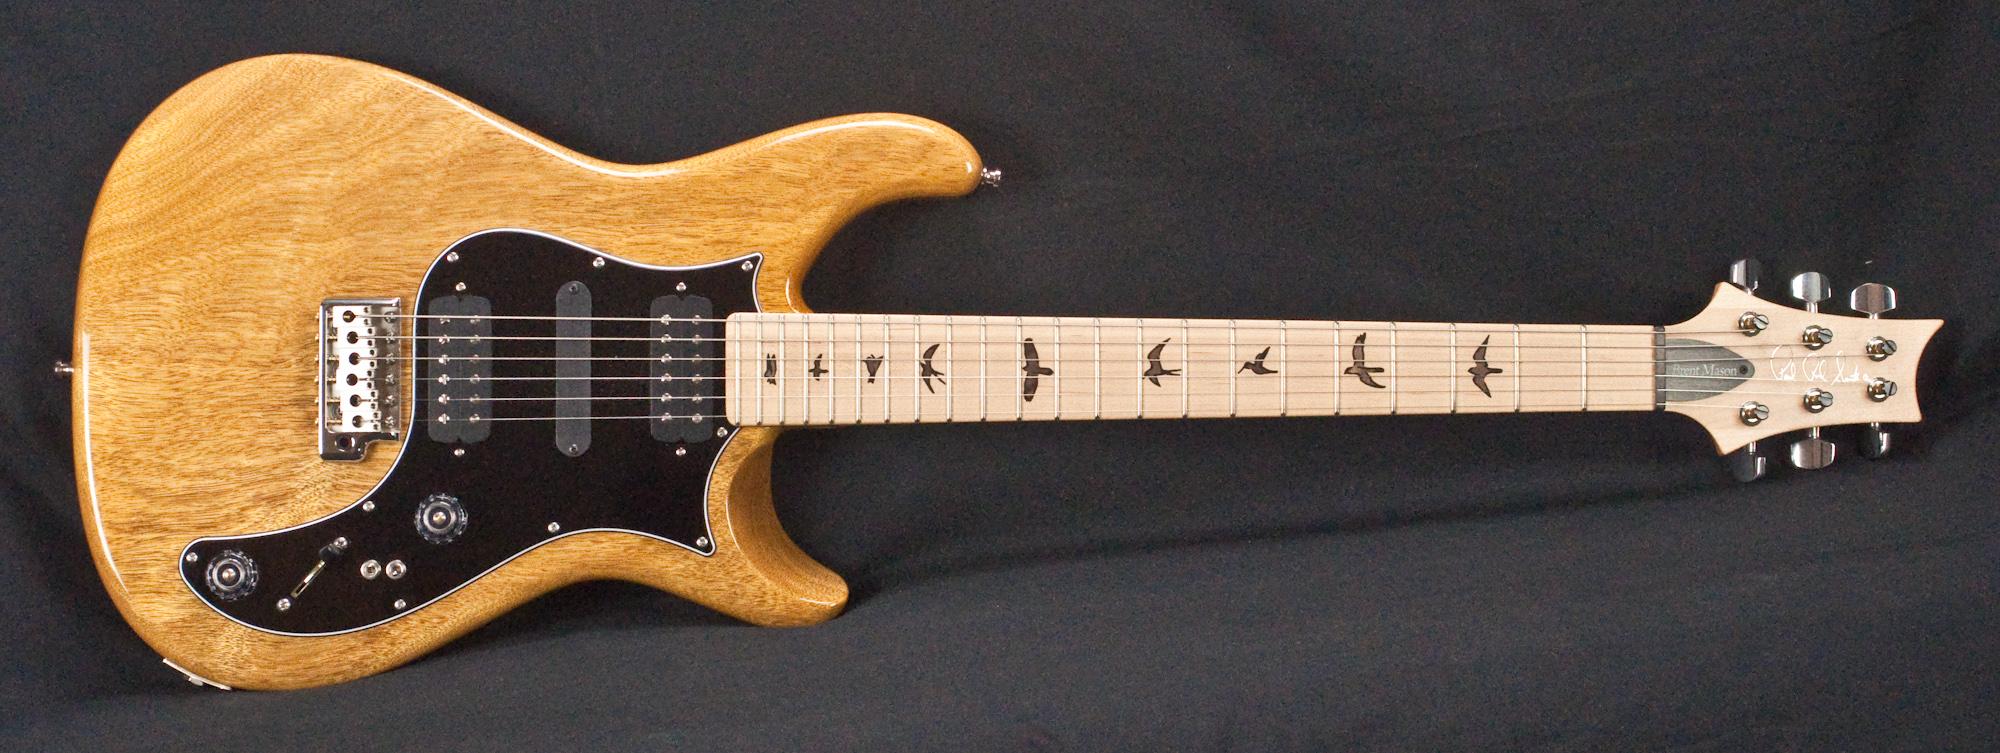 Prs Brent Mason Signature Natural Electric Guitar